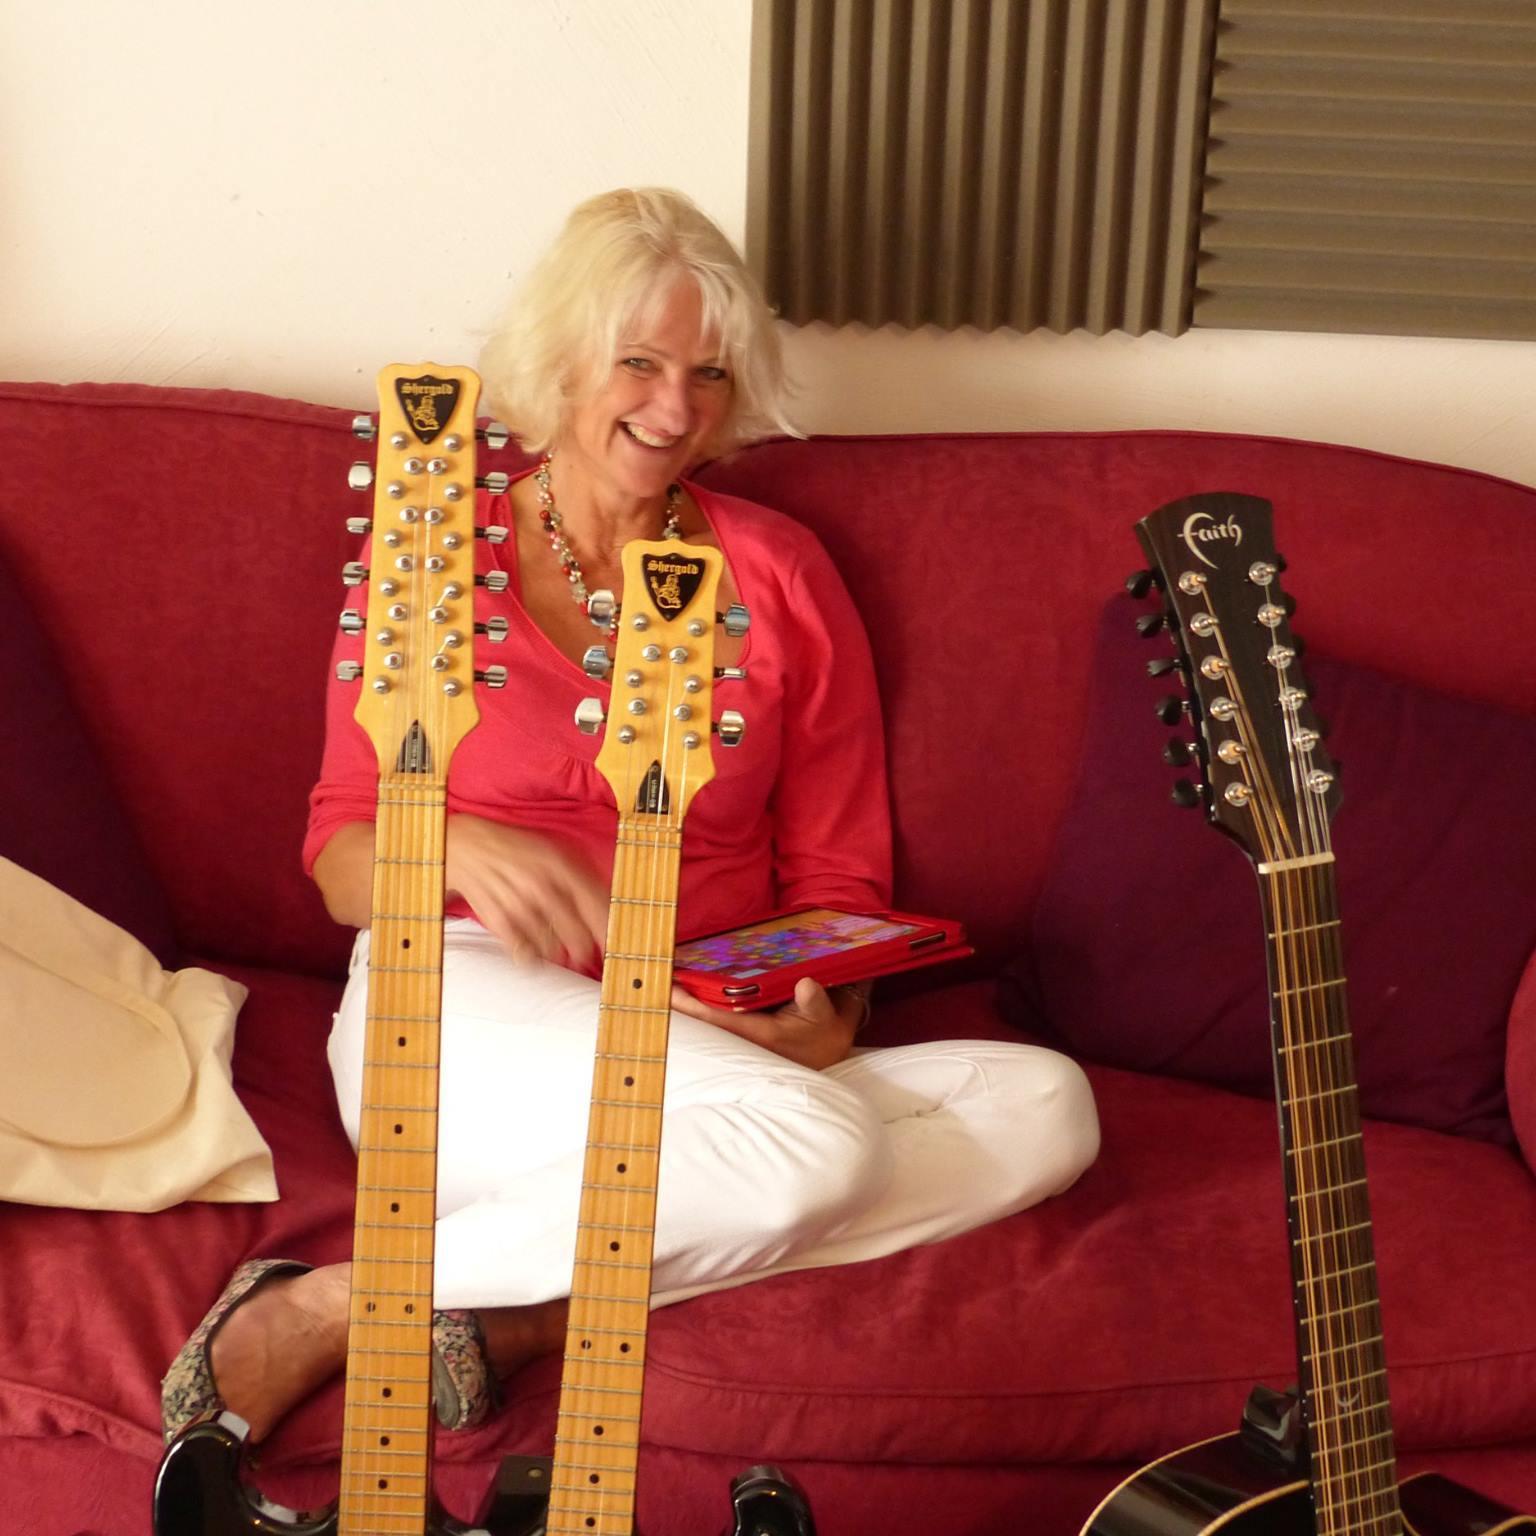 Jo and Colin's guitars